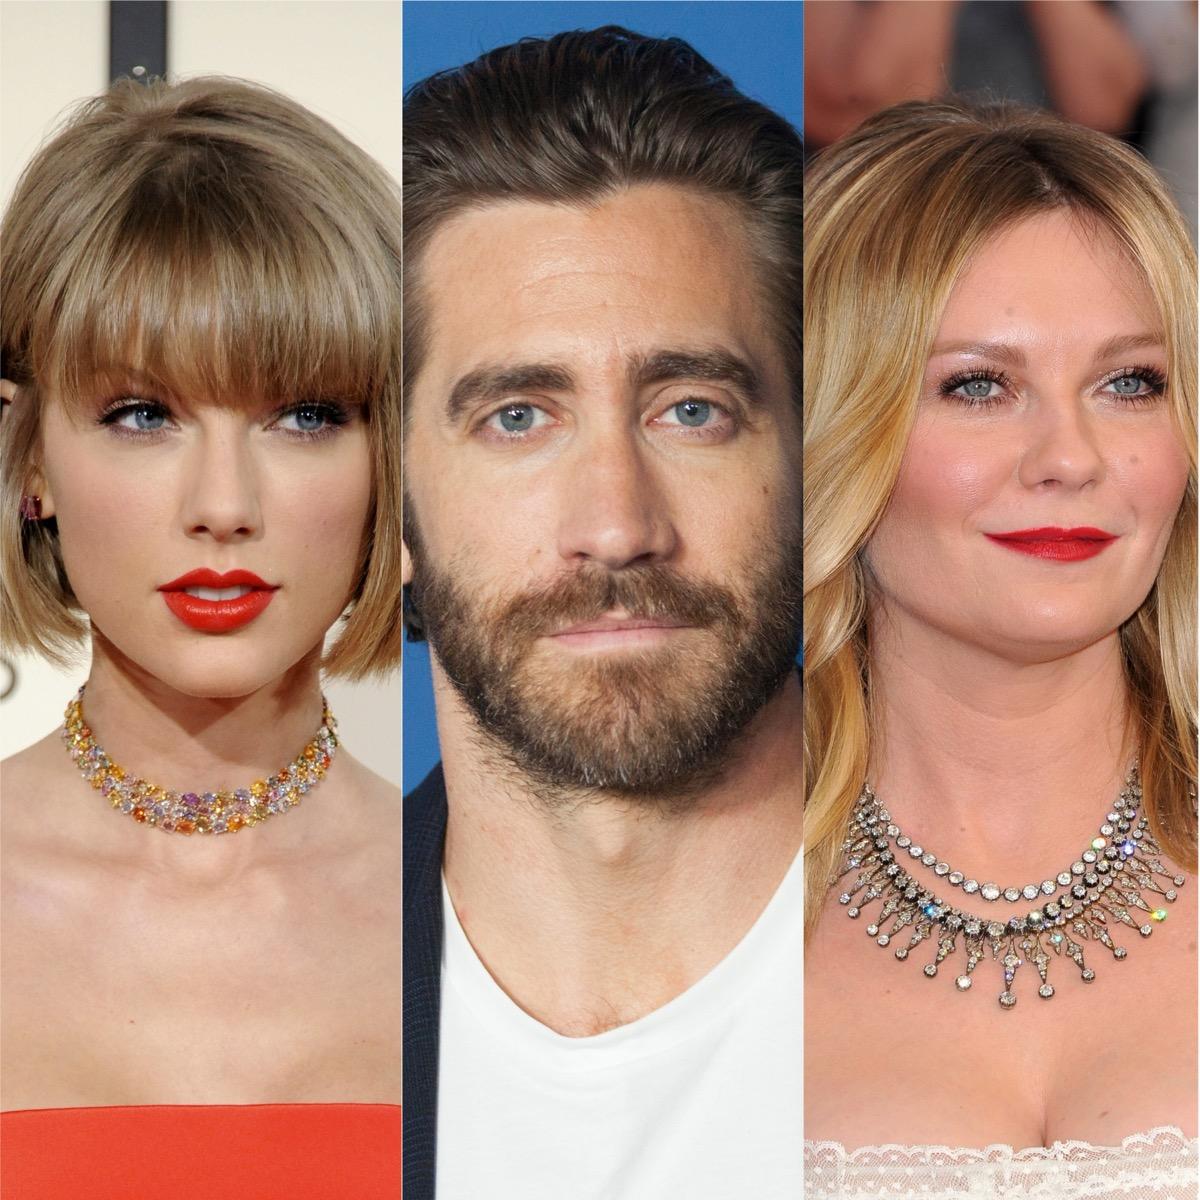 Taylor Swift, Jake Gyllenhaal, and Kirsten Dunst